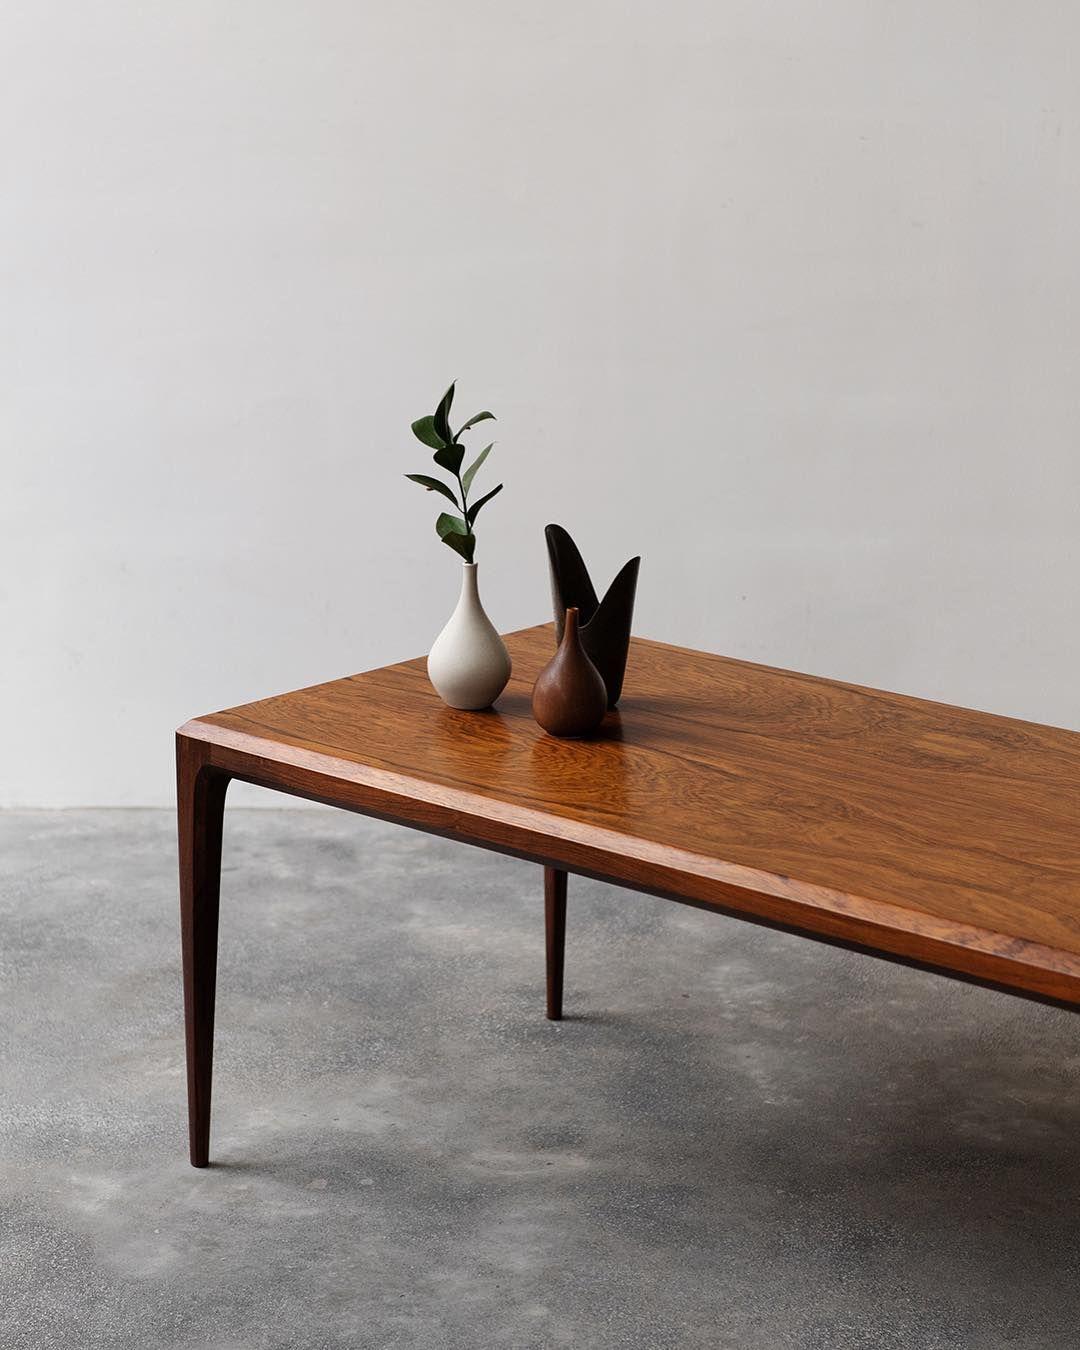 Vintage Danish Coffee Table Designed By Johannes Andersen In Exquisite Brazilian Rosewood Labeled An Coffee Table Danish Coffee Table Minimalist Coffee Table [ 1350 x 1080 Pixel ]